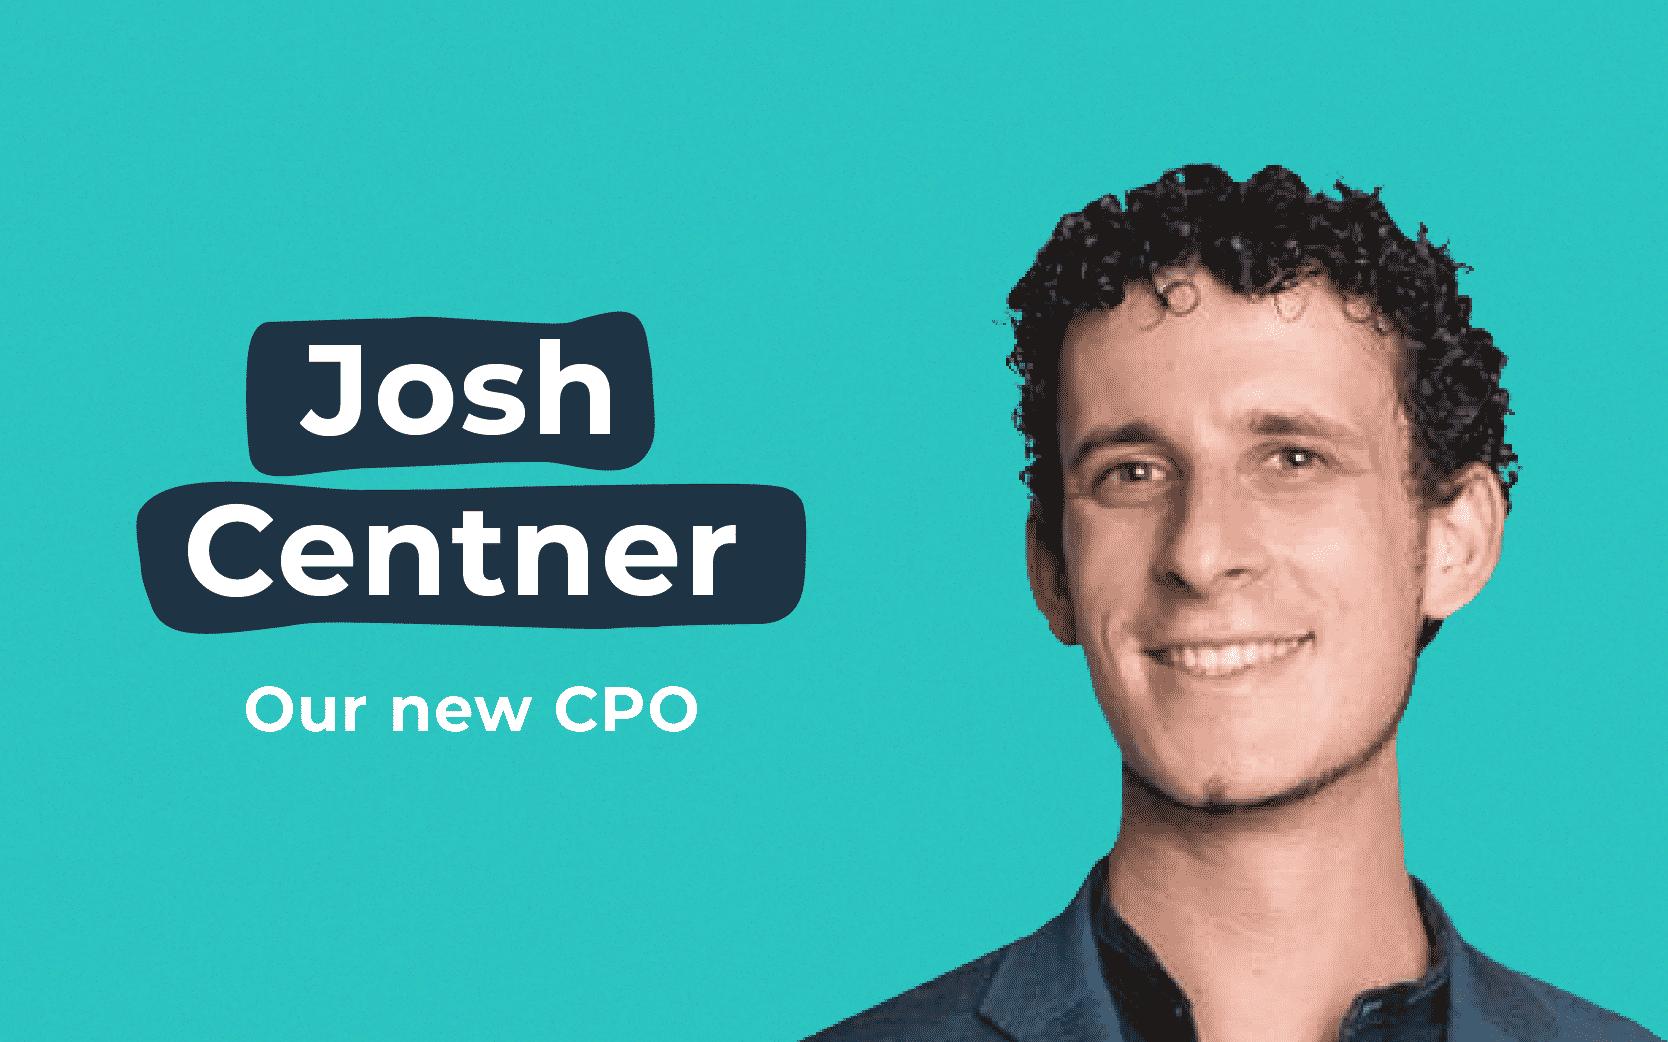 Josh Centner header image 2